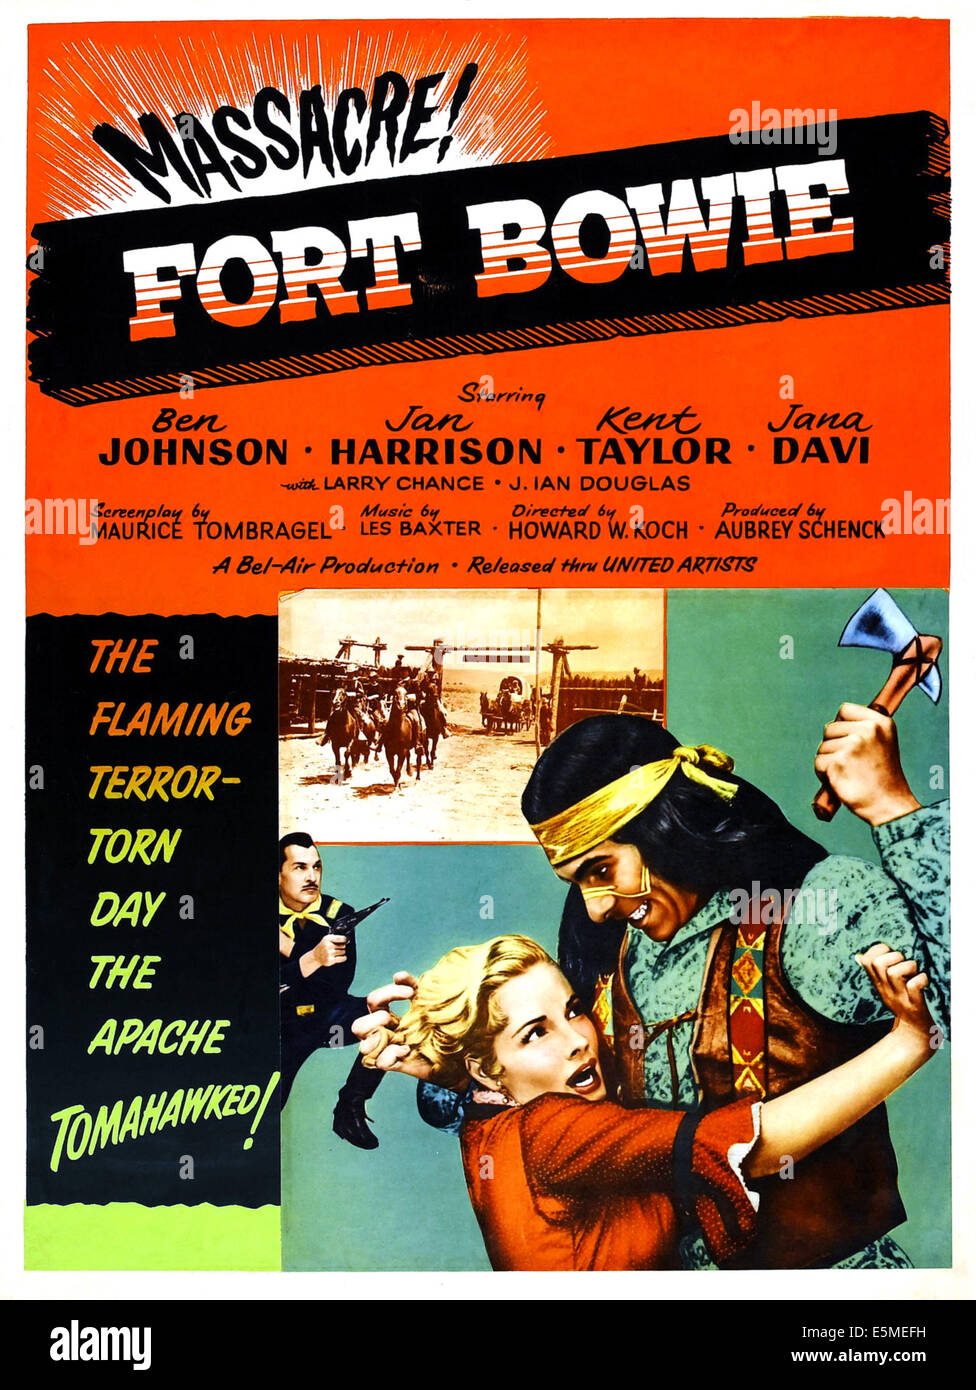 FORT BOWIE, Ben Johnson, Jan Harrison, 1958. - Stock Image